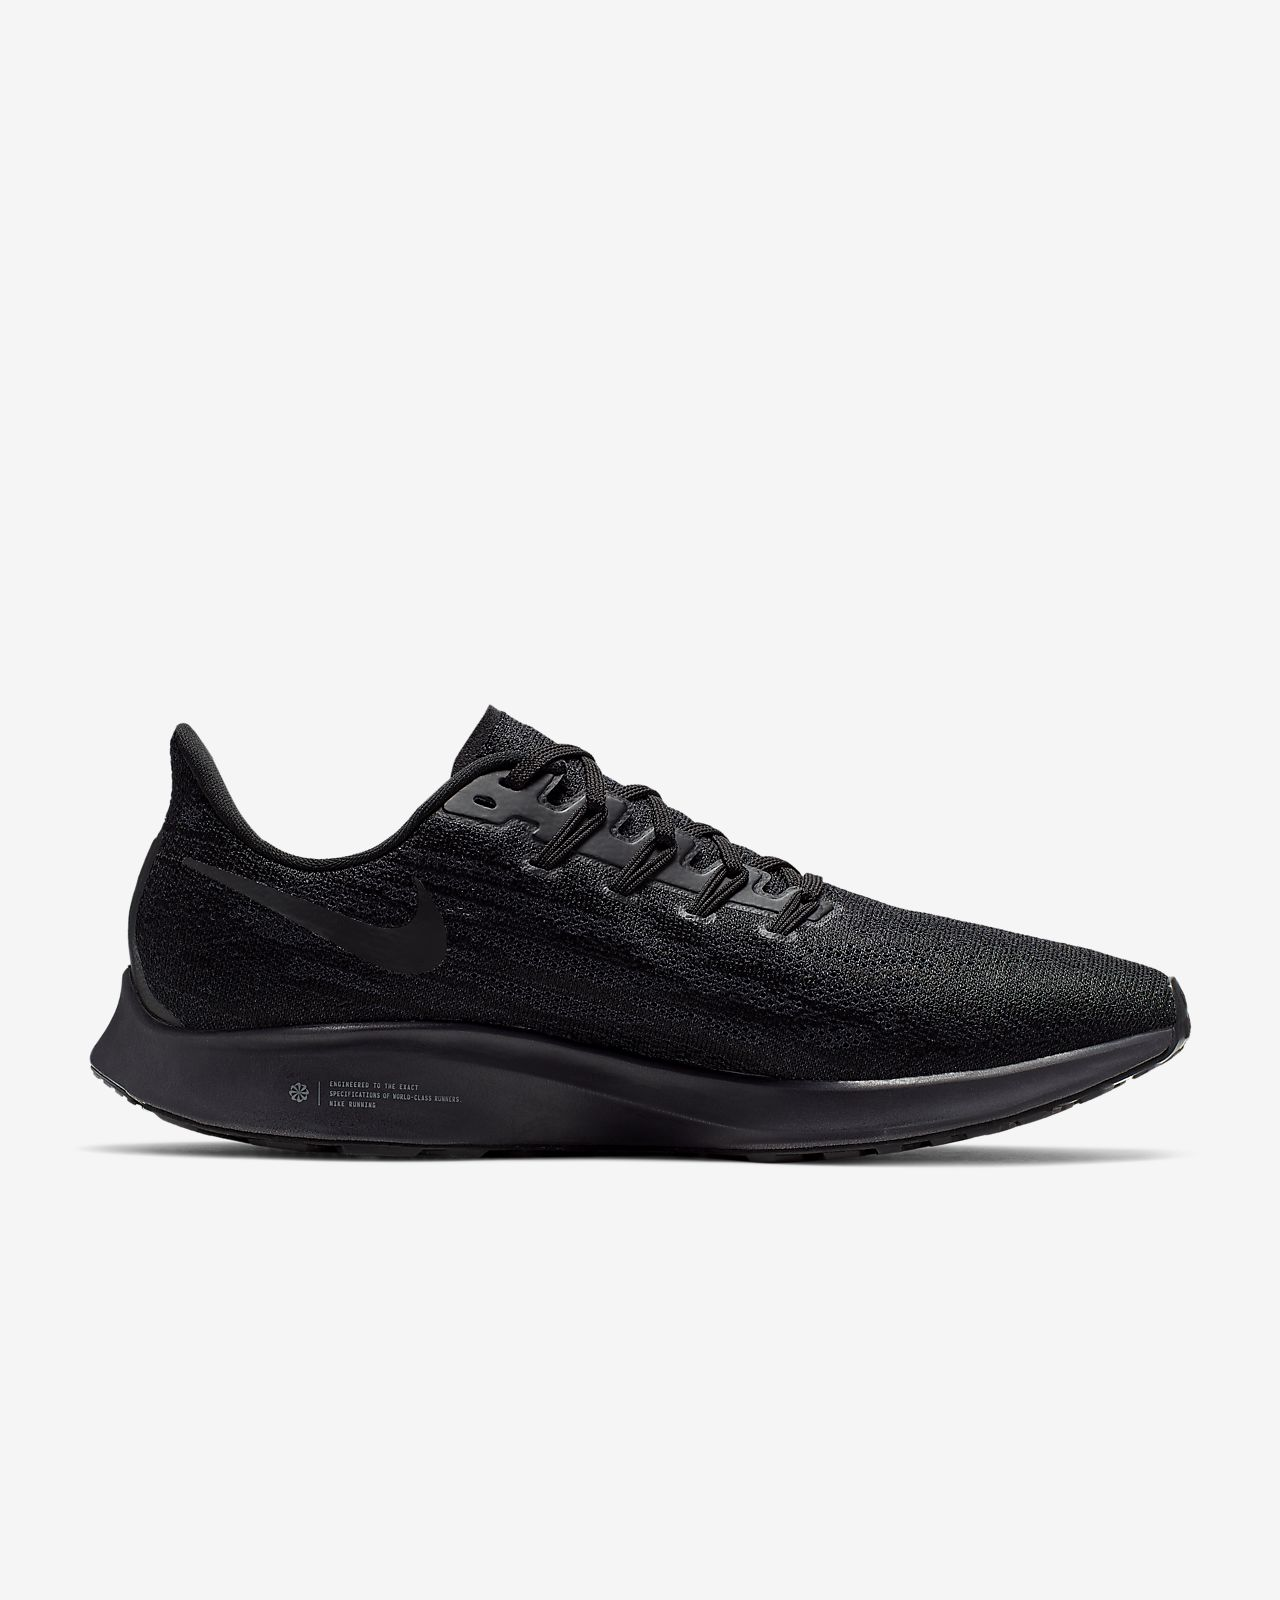 Black Running shoes Nike Air Zoom Pegasus 36 M AQ2203 006